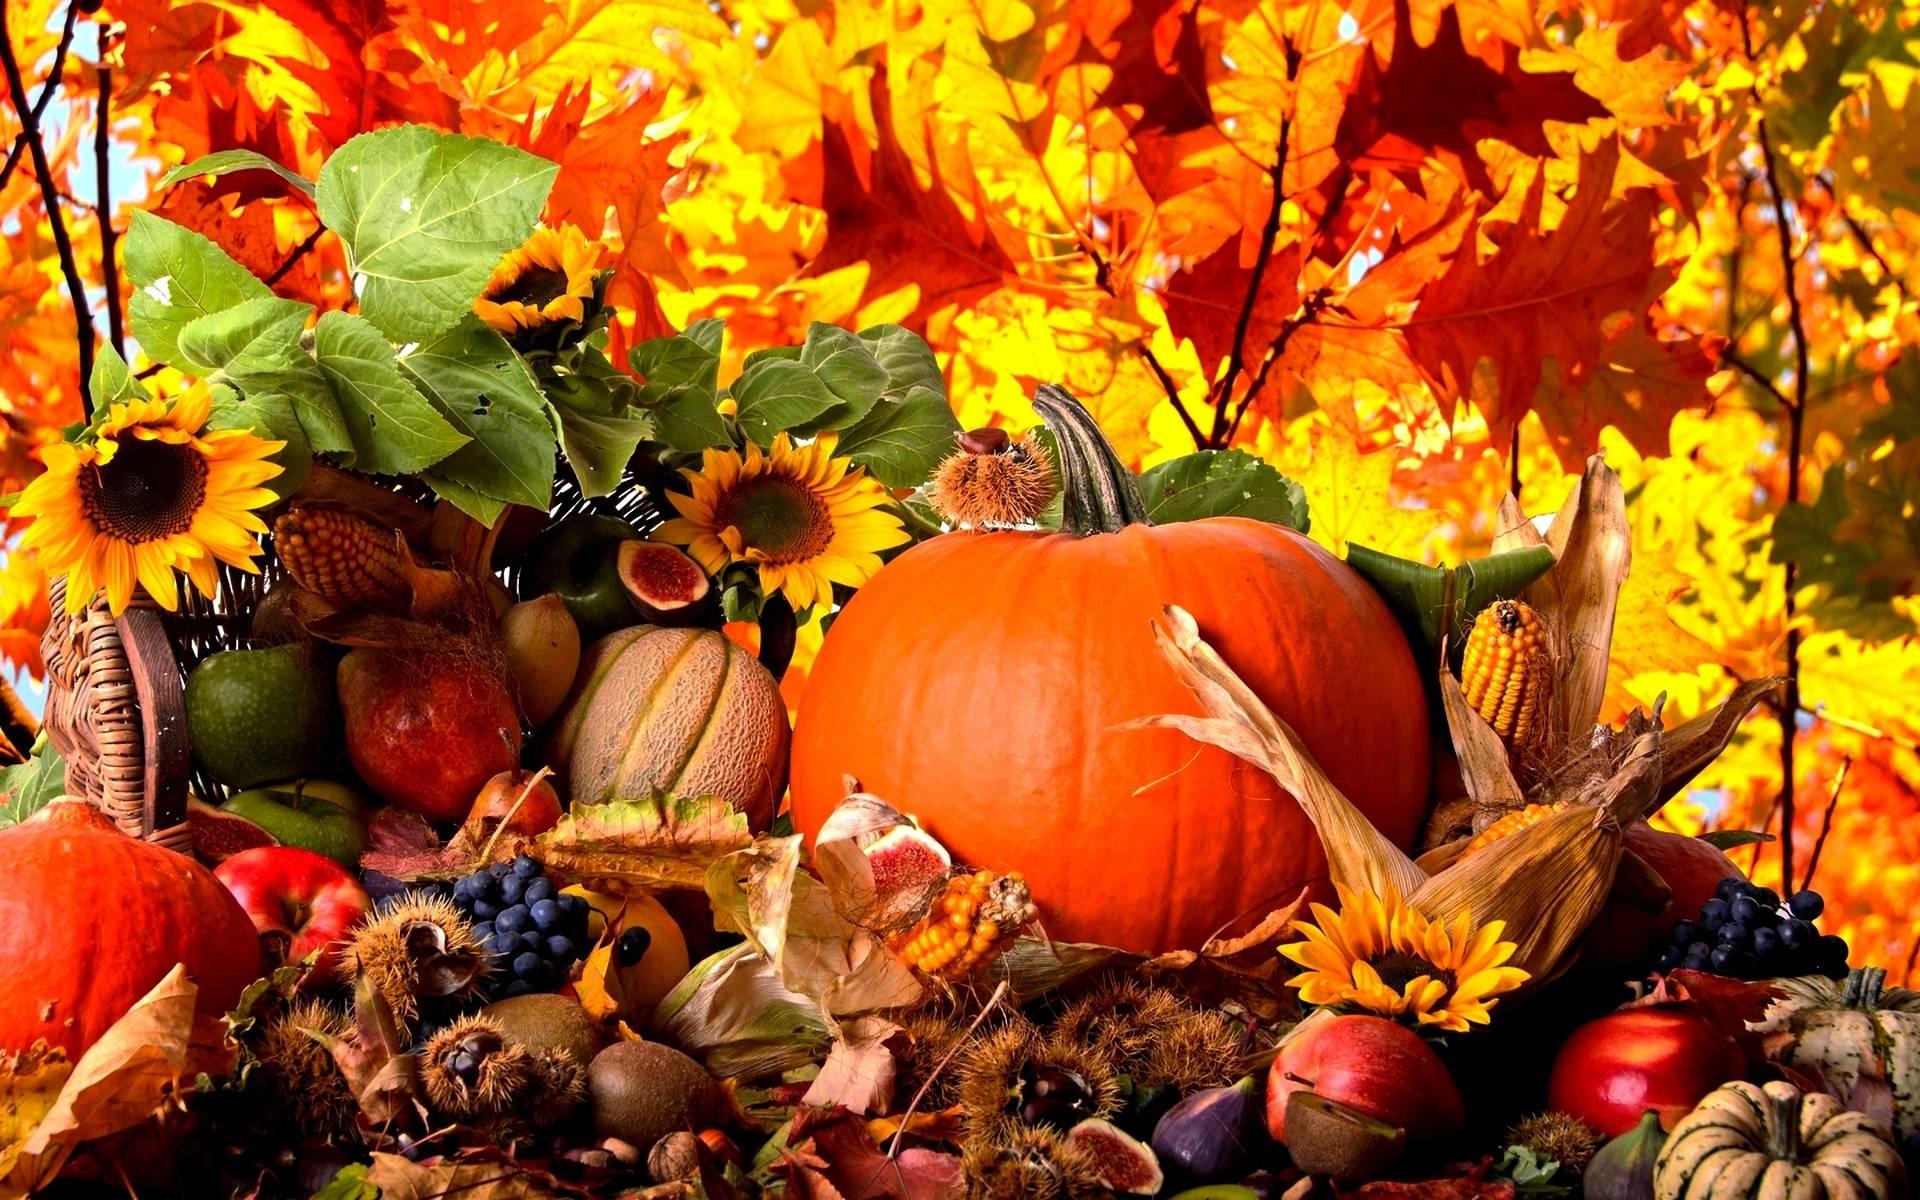 Wallpaper download free image search hd - 1920x1200 Thanksgiving Wallpapers Full Hd Wallpaper Search Page 5 Download